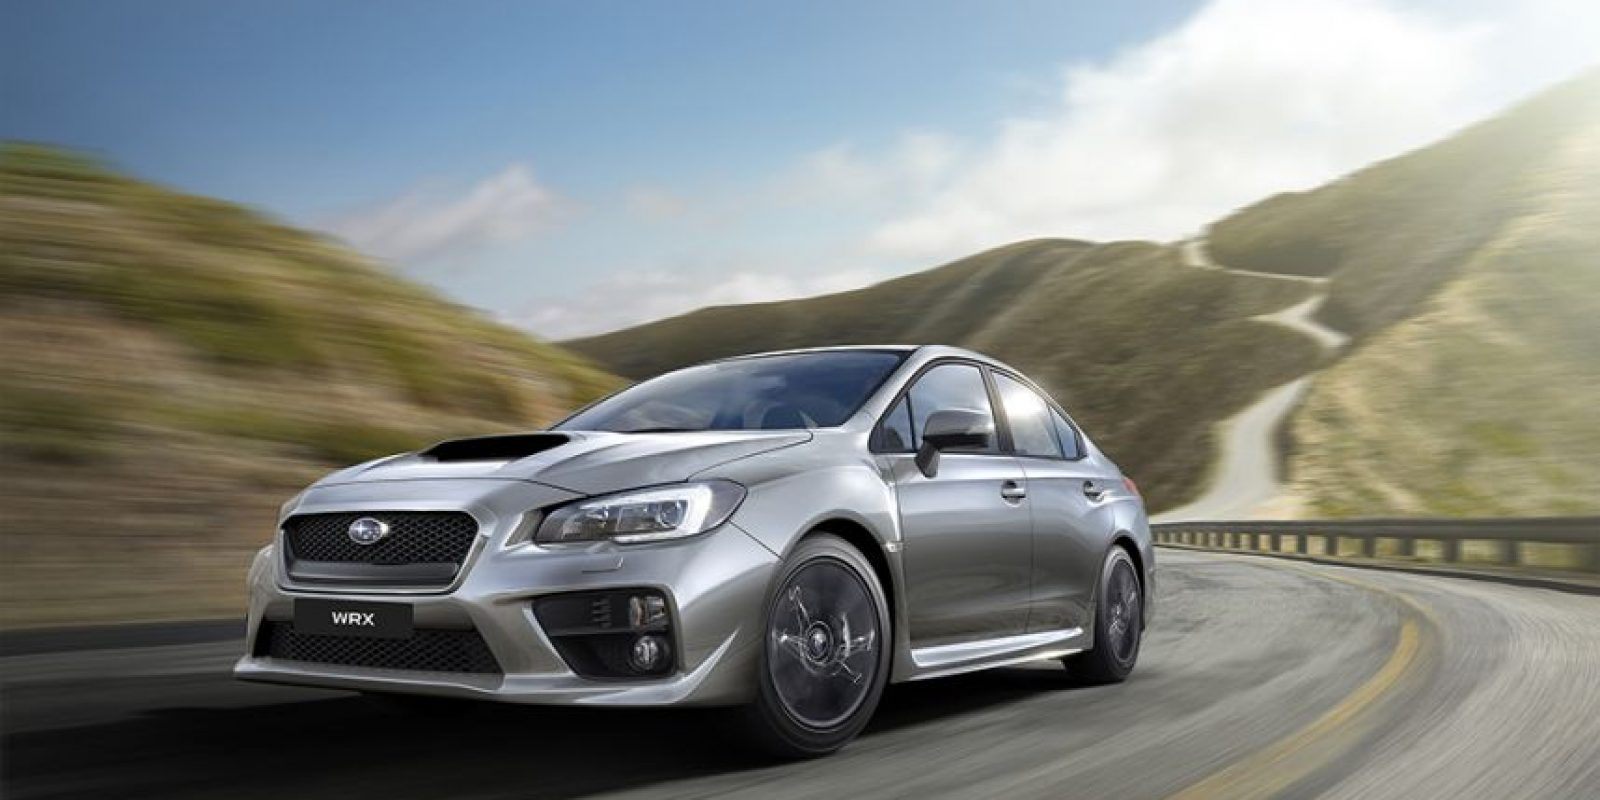 Foto:Subaru